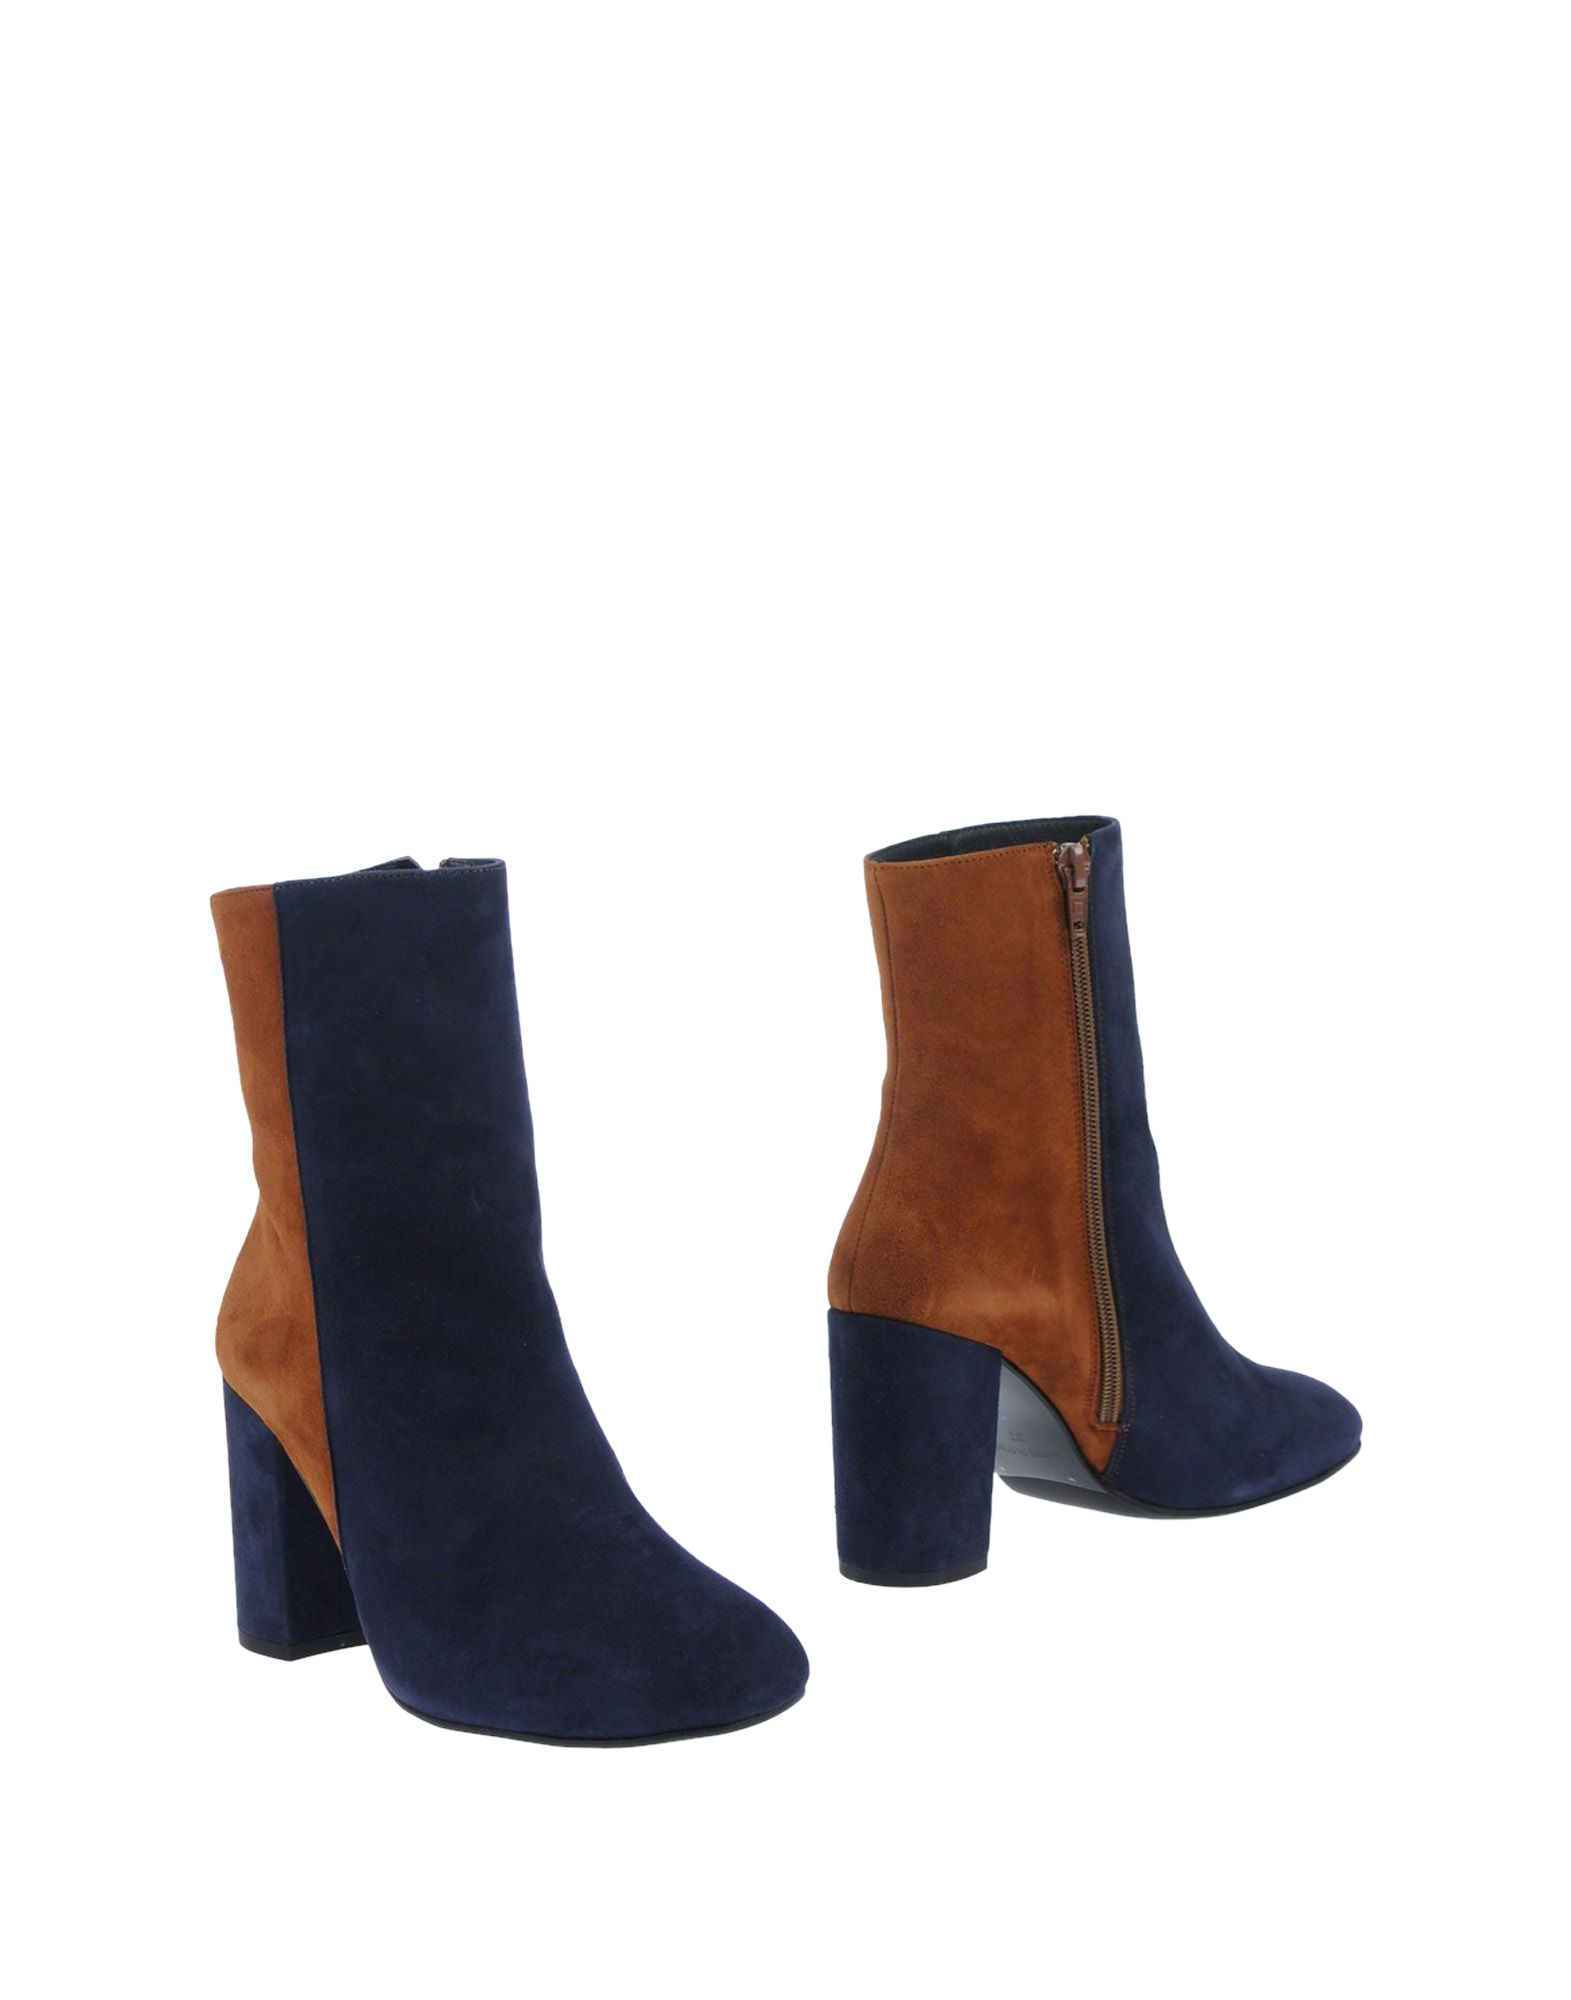 Rabatt Schuhe 11508708LN Heliā Stiefelette Damen  11508708LN Schuhe 1f0f45